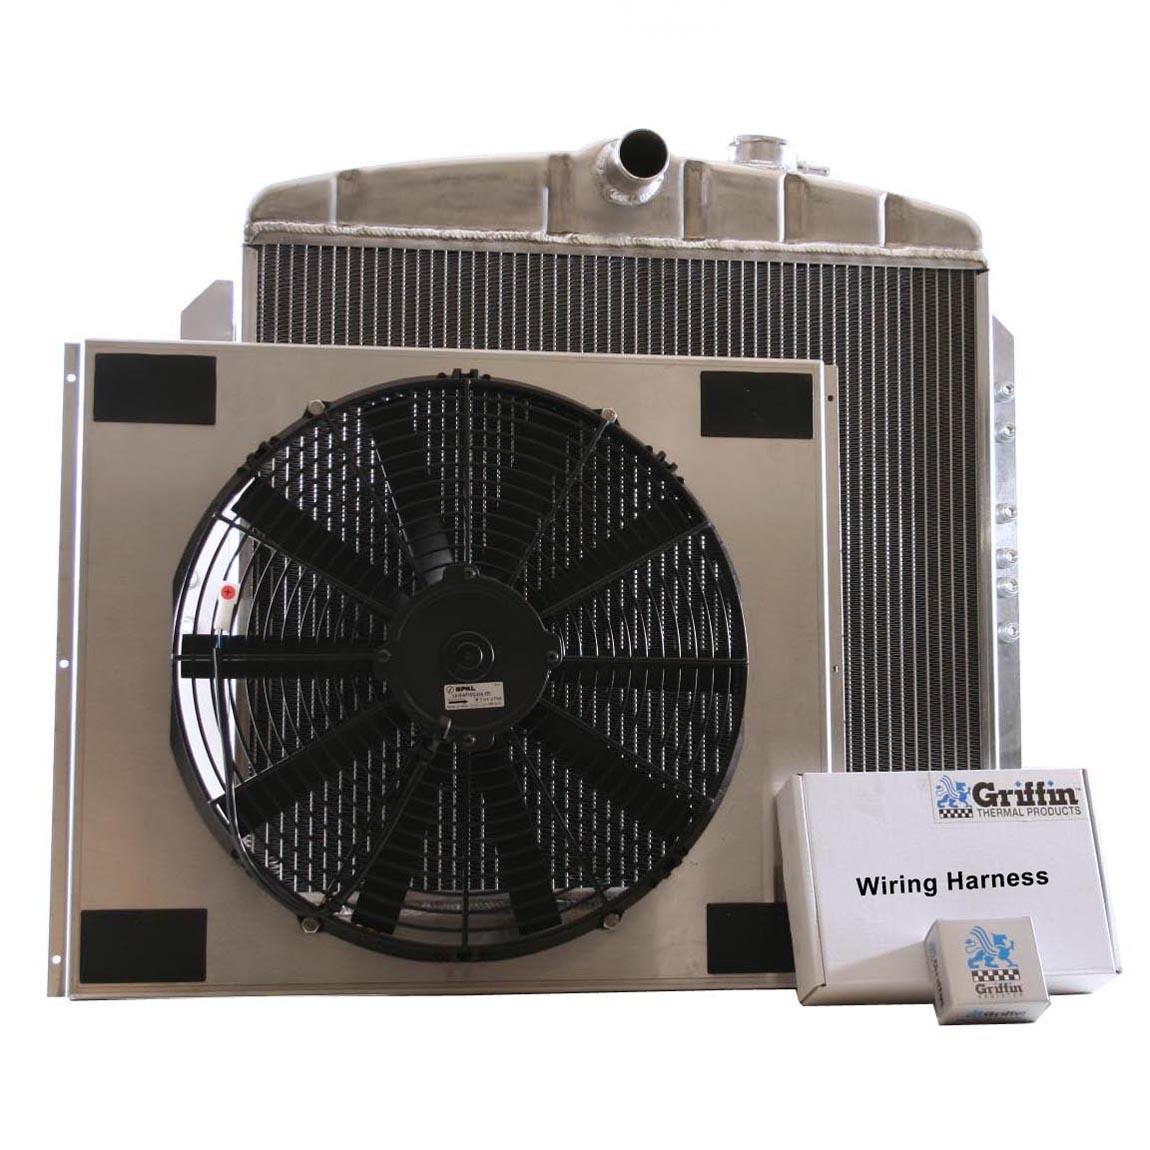 hight resolution of 1951 chevrolet griffin aluminum radiator part number 6 00076